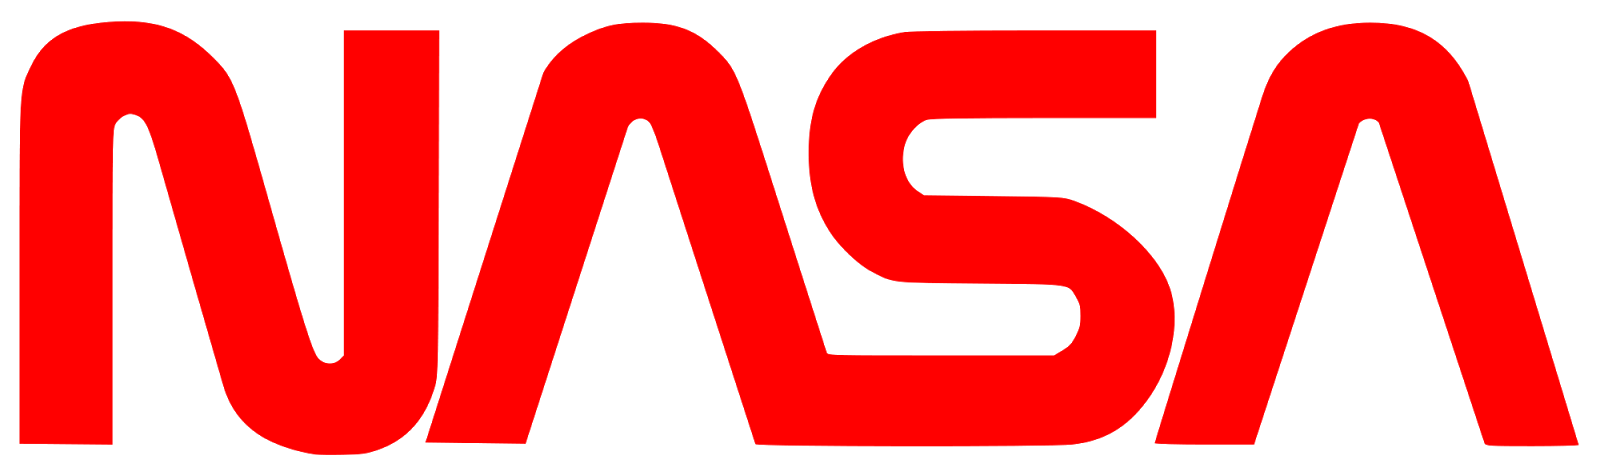 nasa worm logo - photo #15